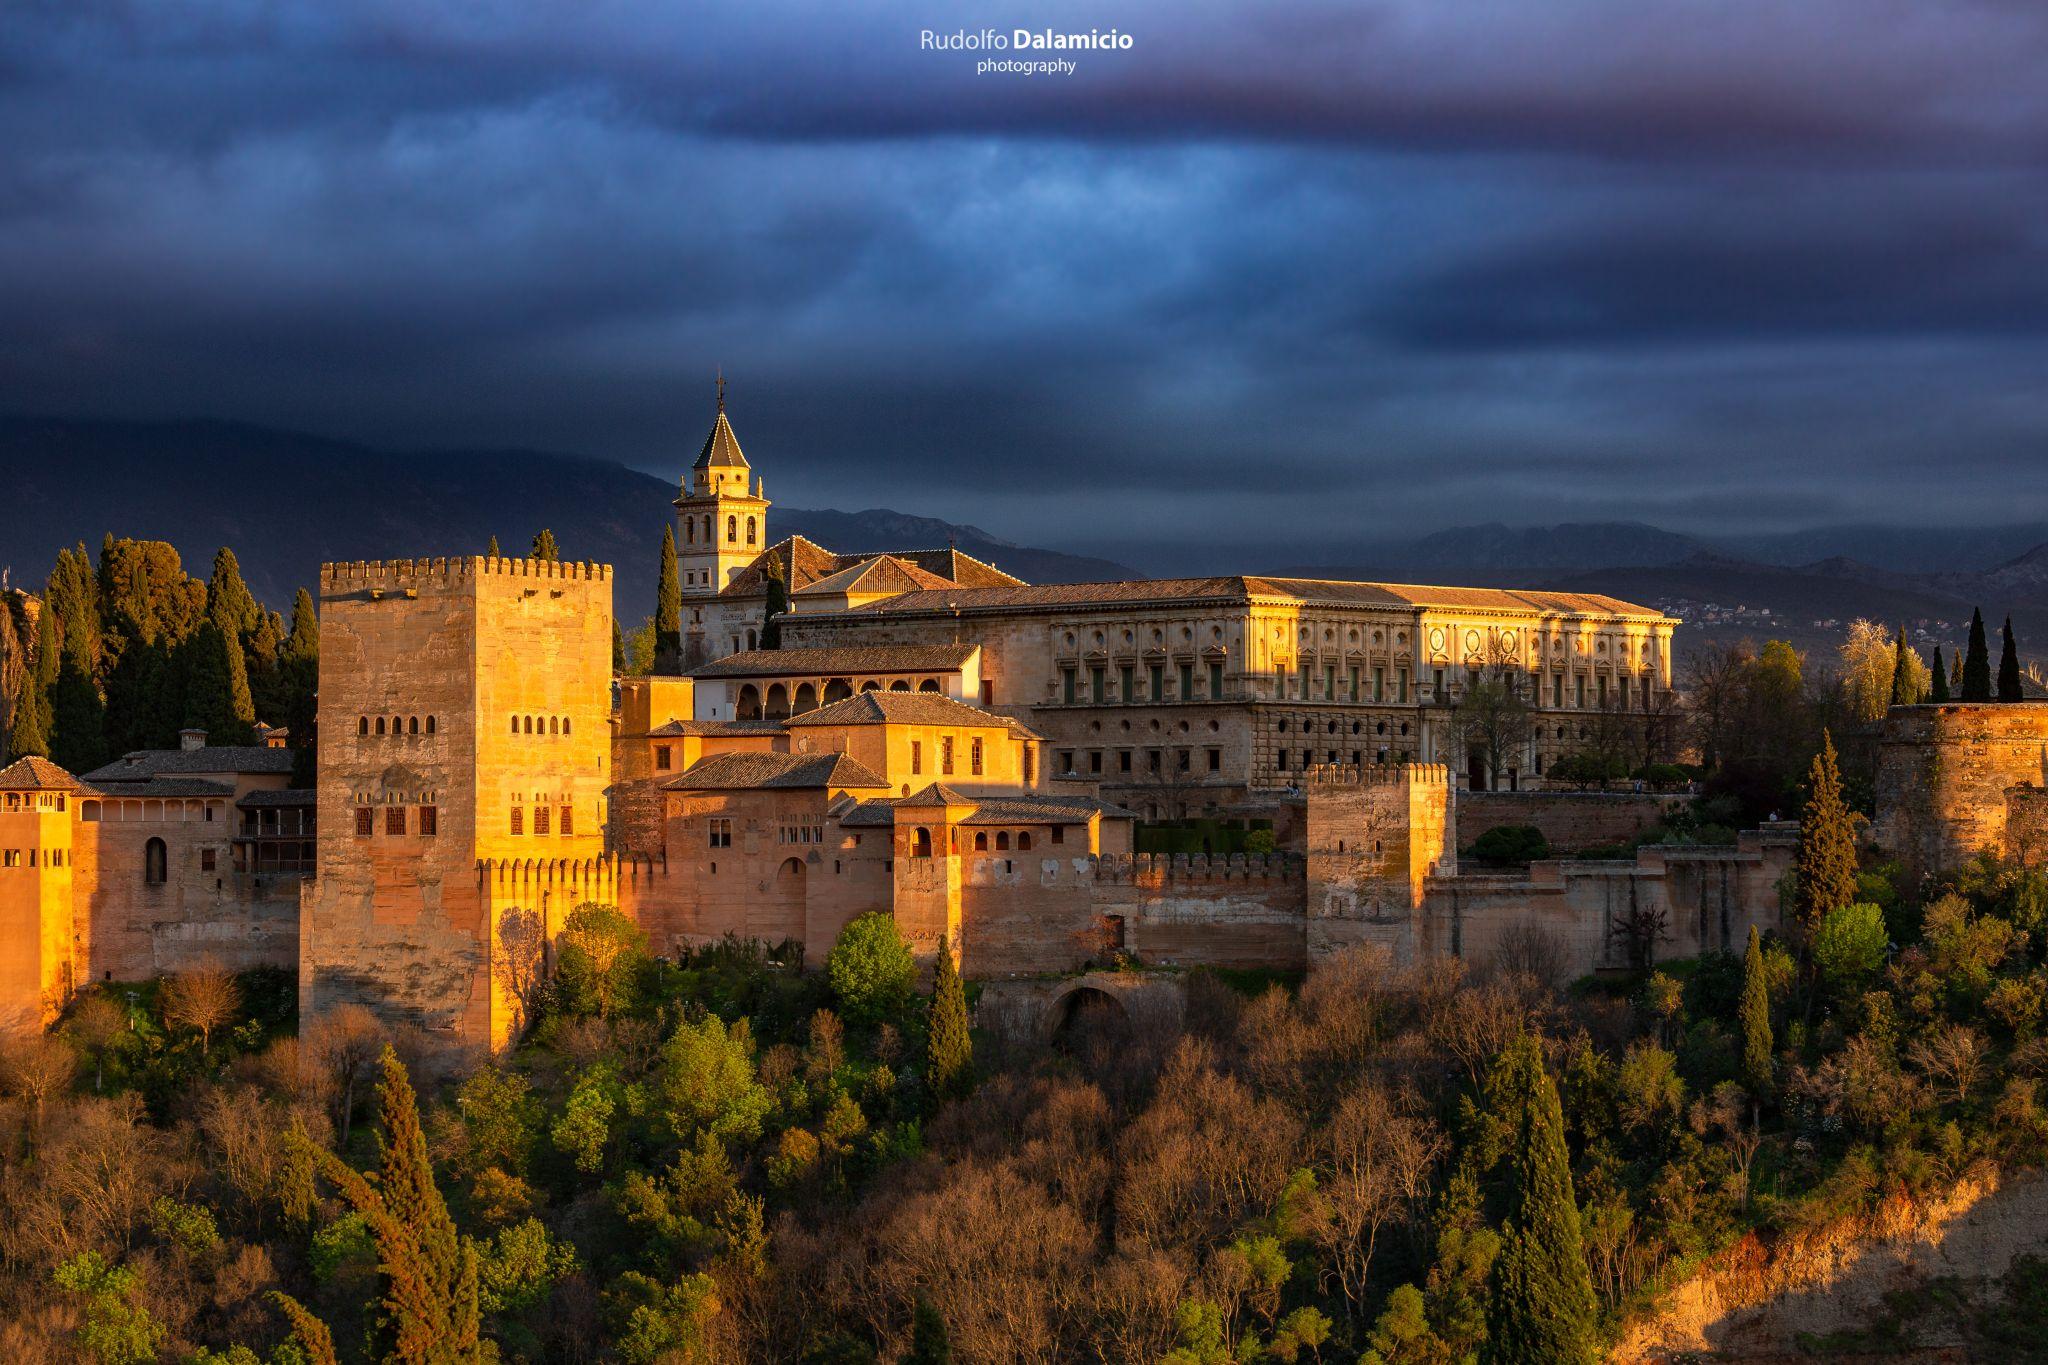 Illuminated Alhambra, Spain